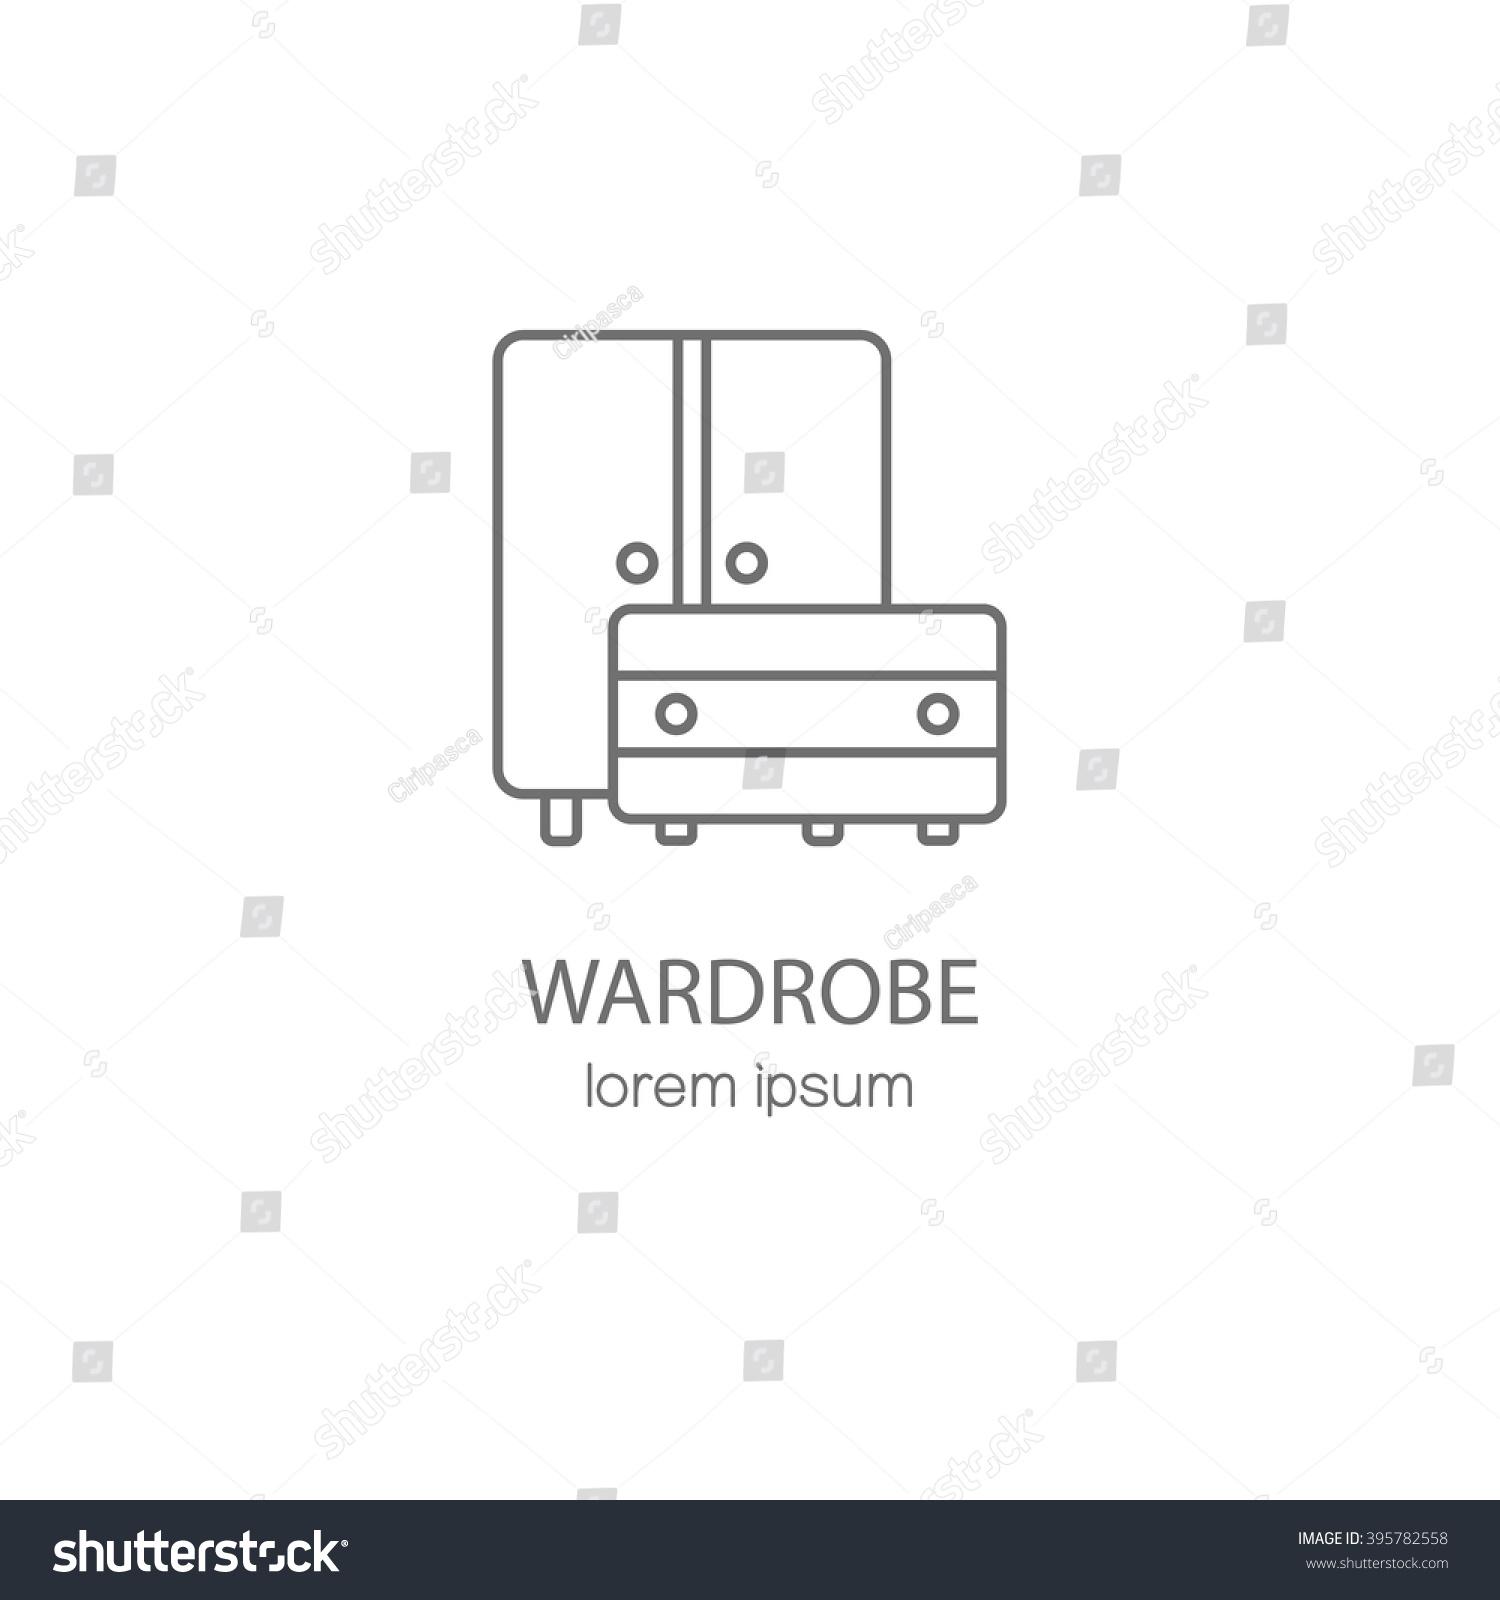 wardrobe template. wardrobe wood furniture logotype design templates modern easy to edit logo template vector